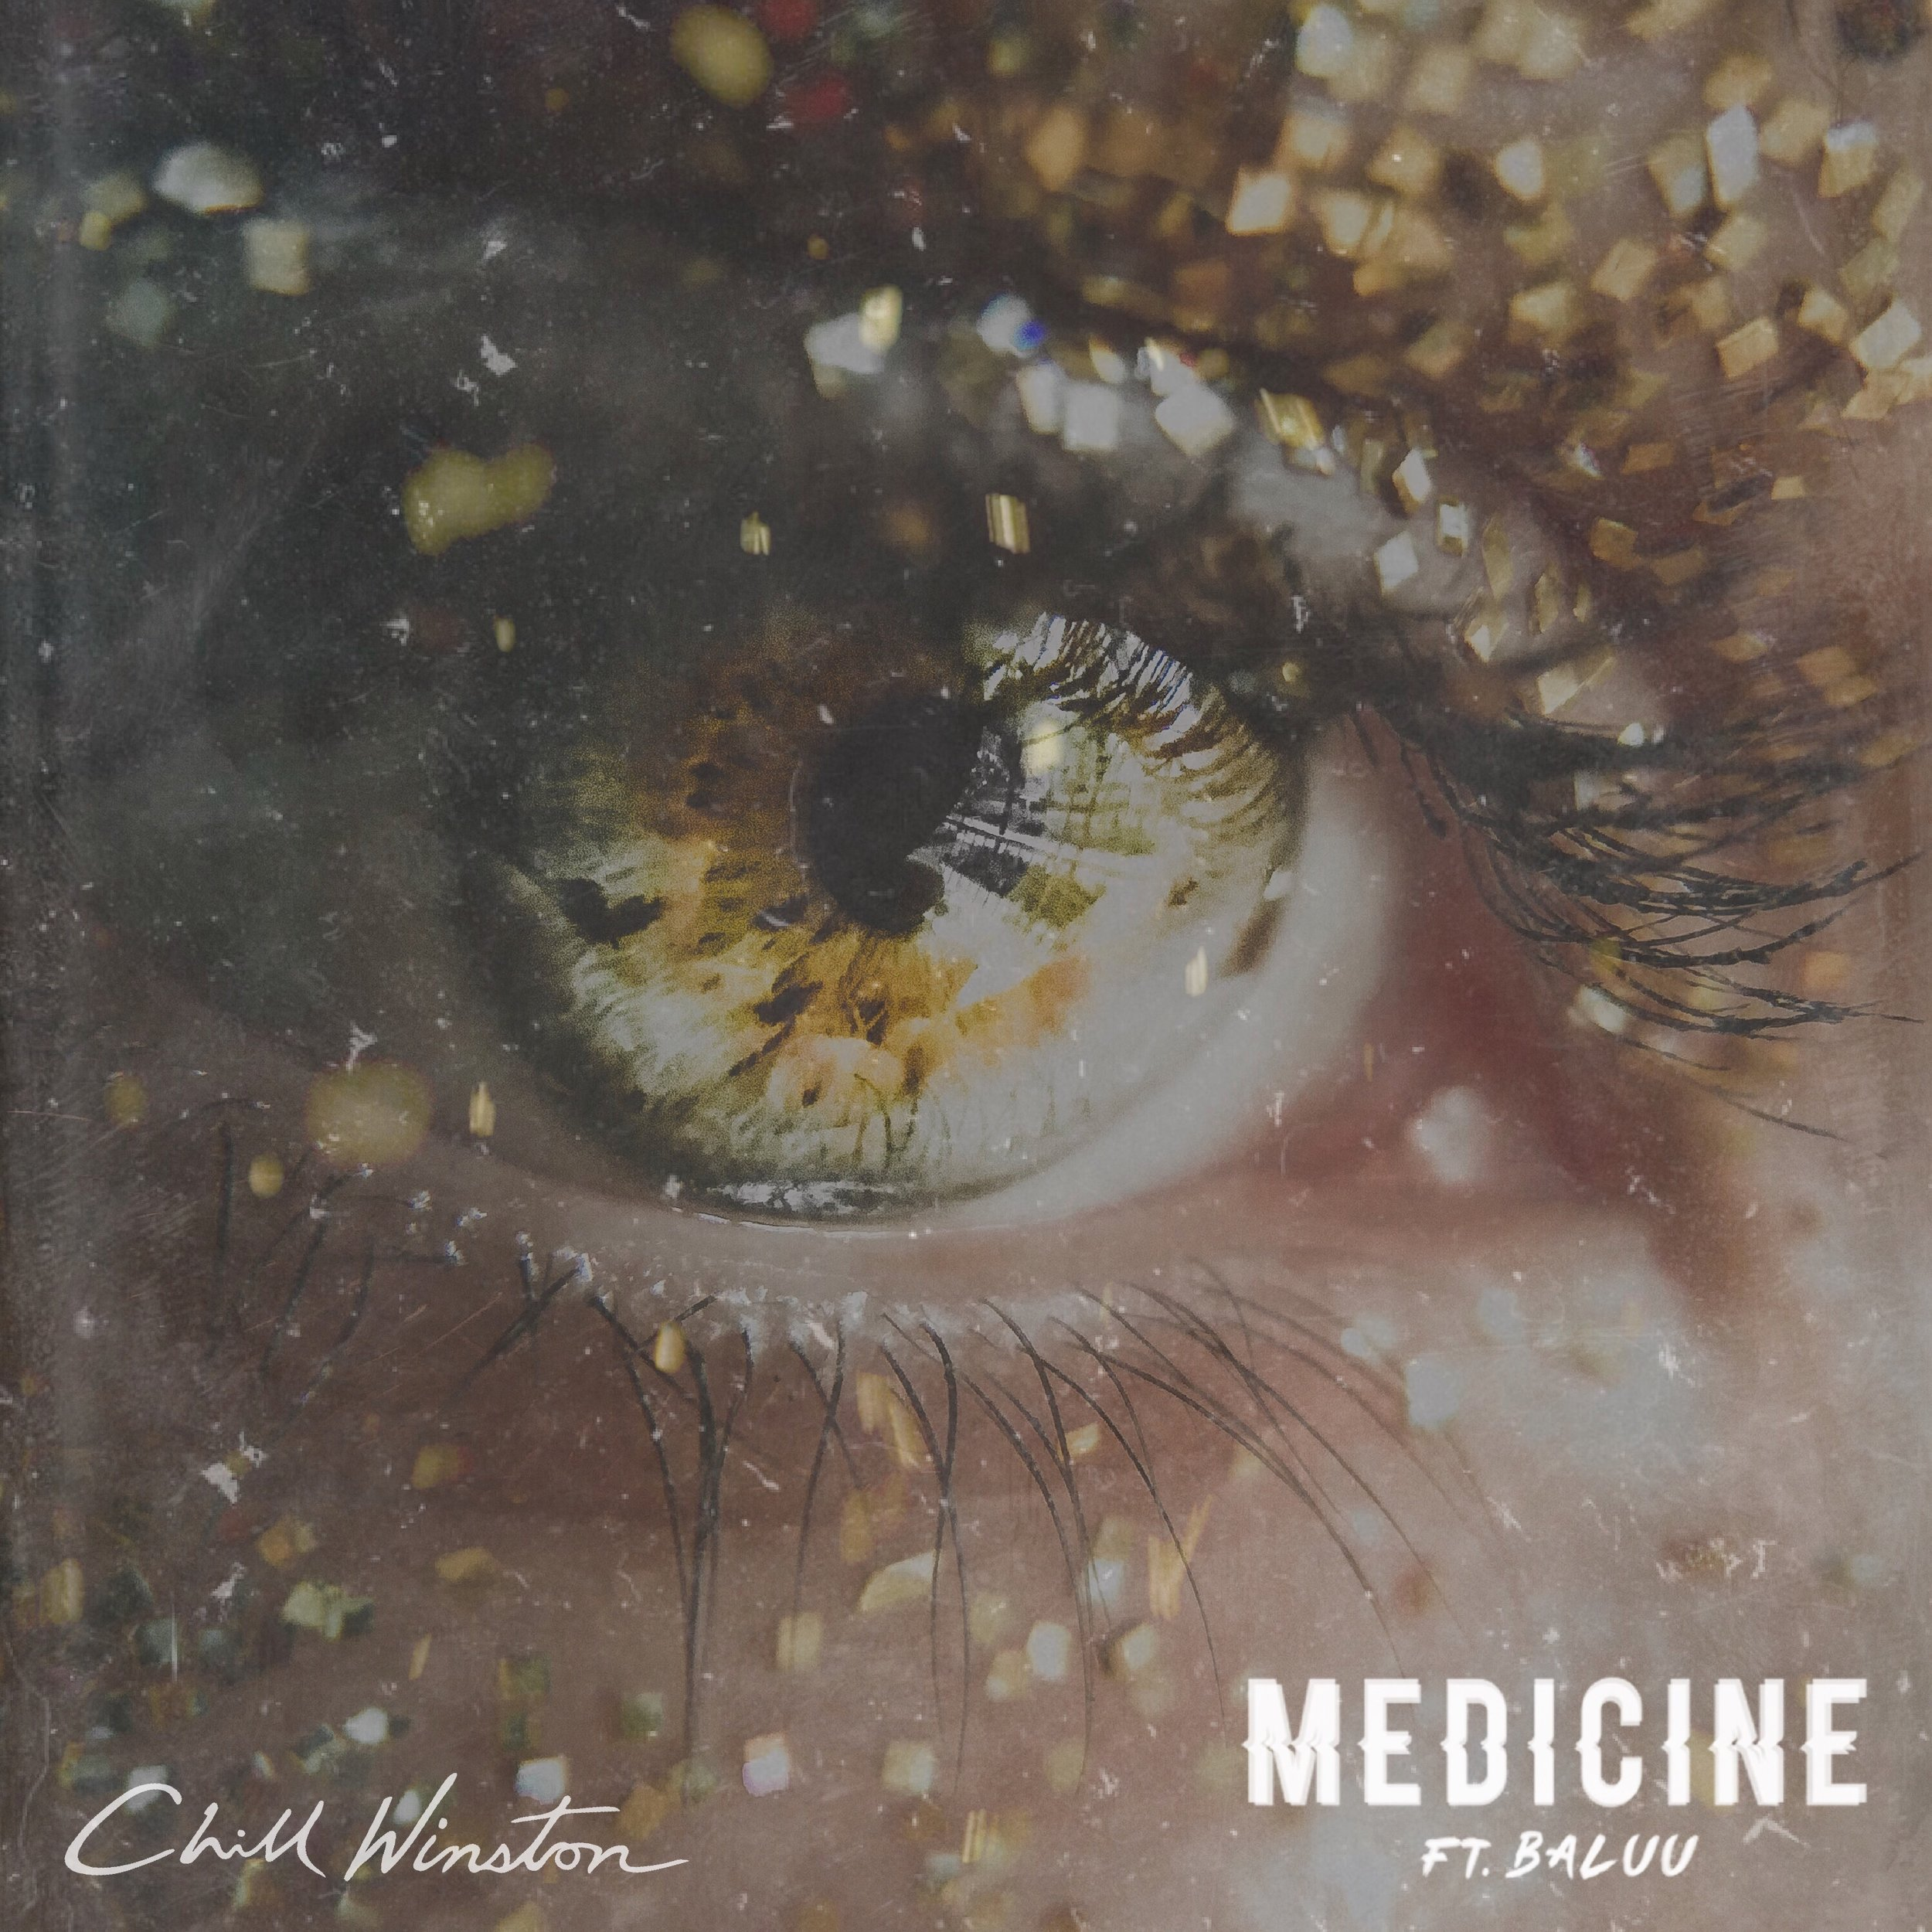 CHILL WINSTON & BALUU - MEDICINE